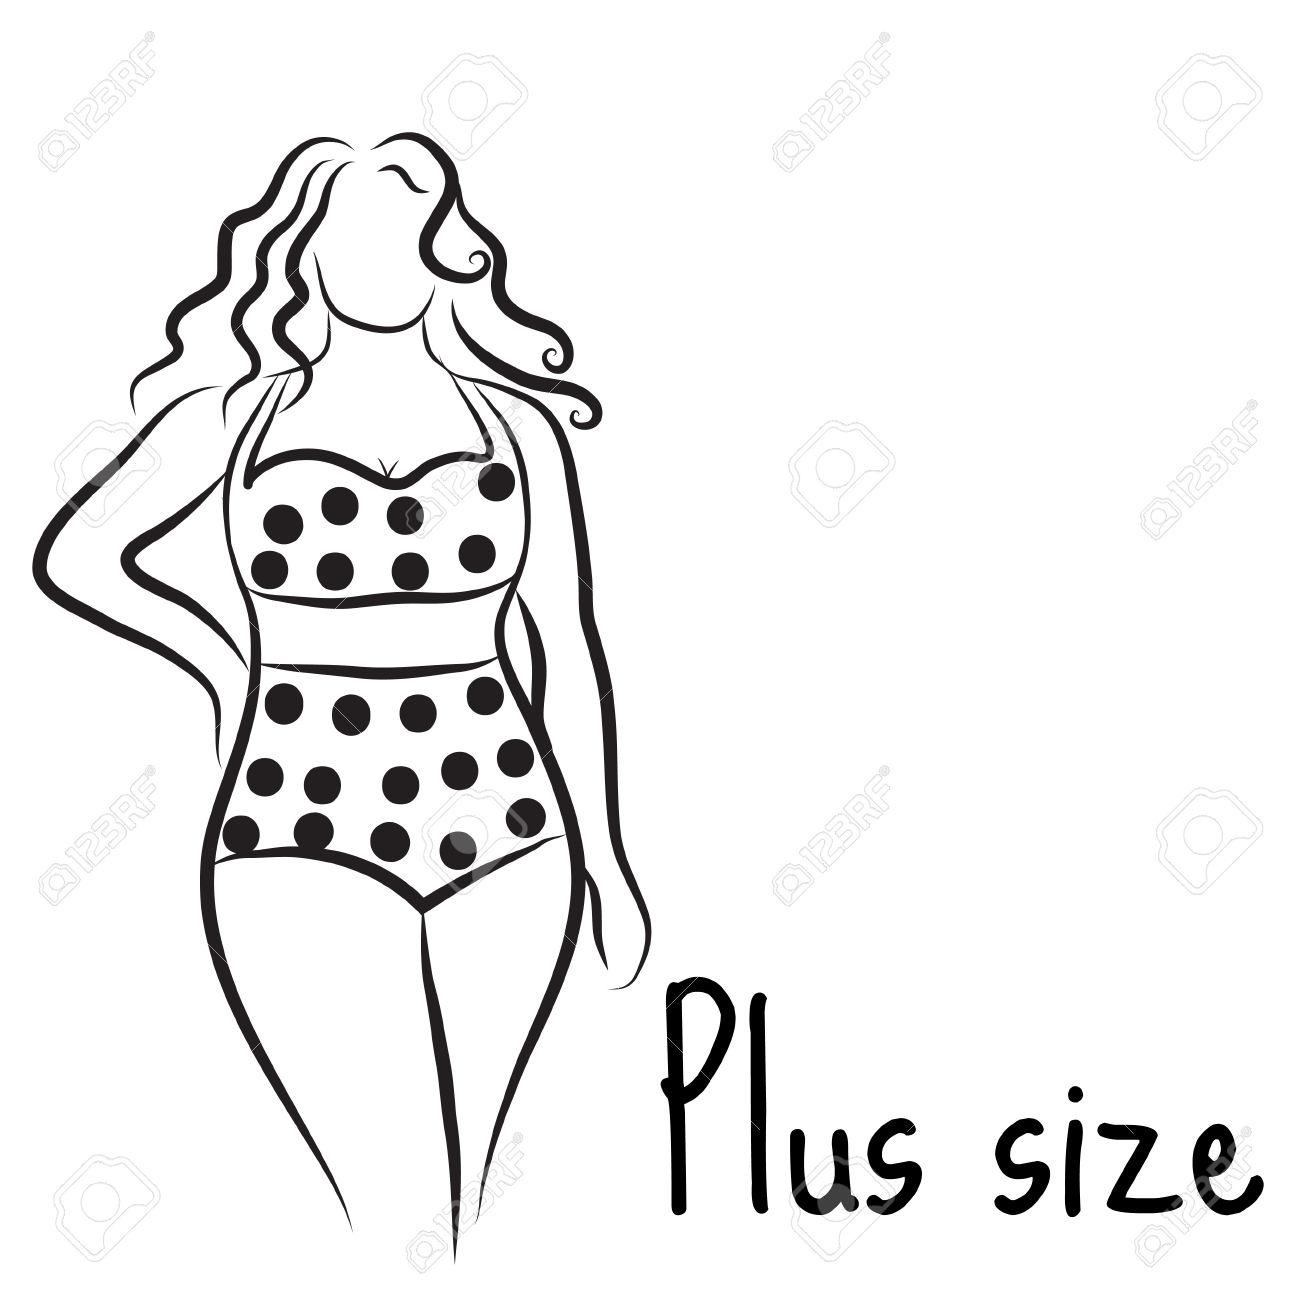 Girl Silhouette Sketch Plus Size Model. Curvy Woman Symbol. Vector.